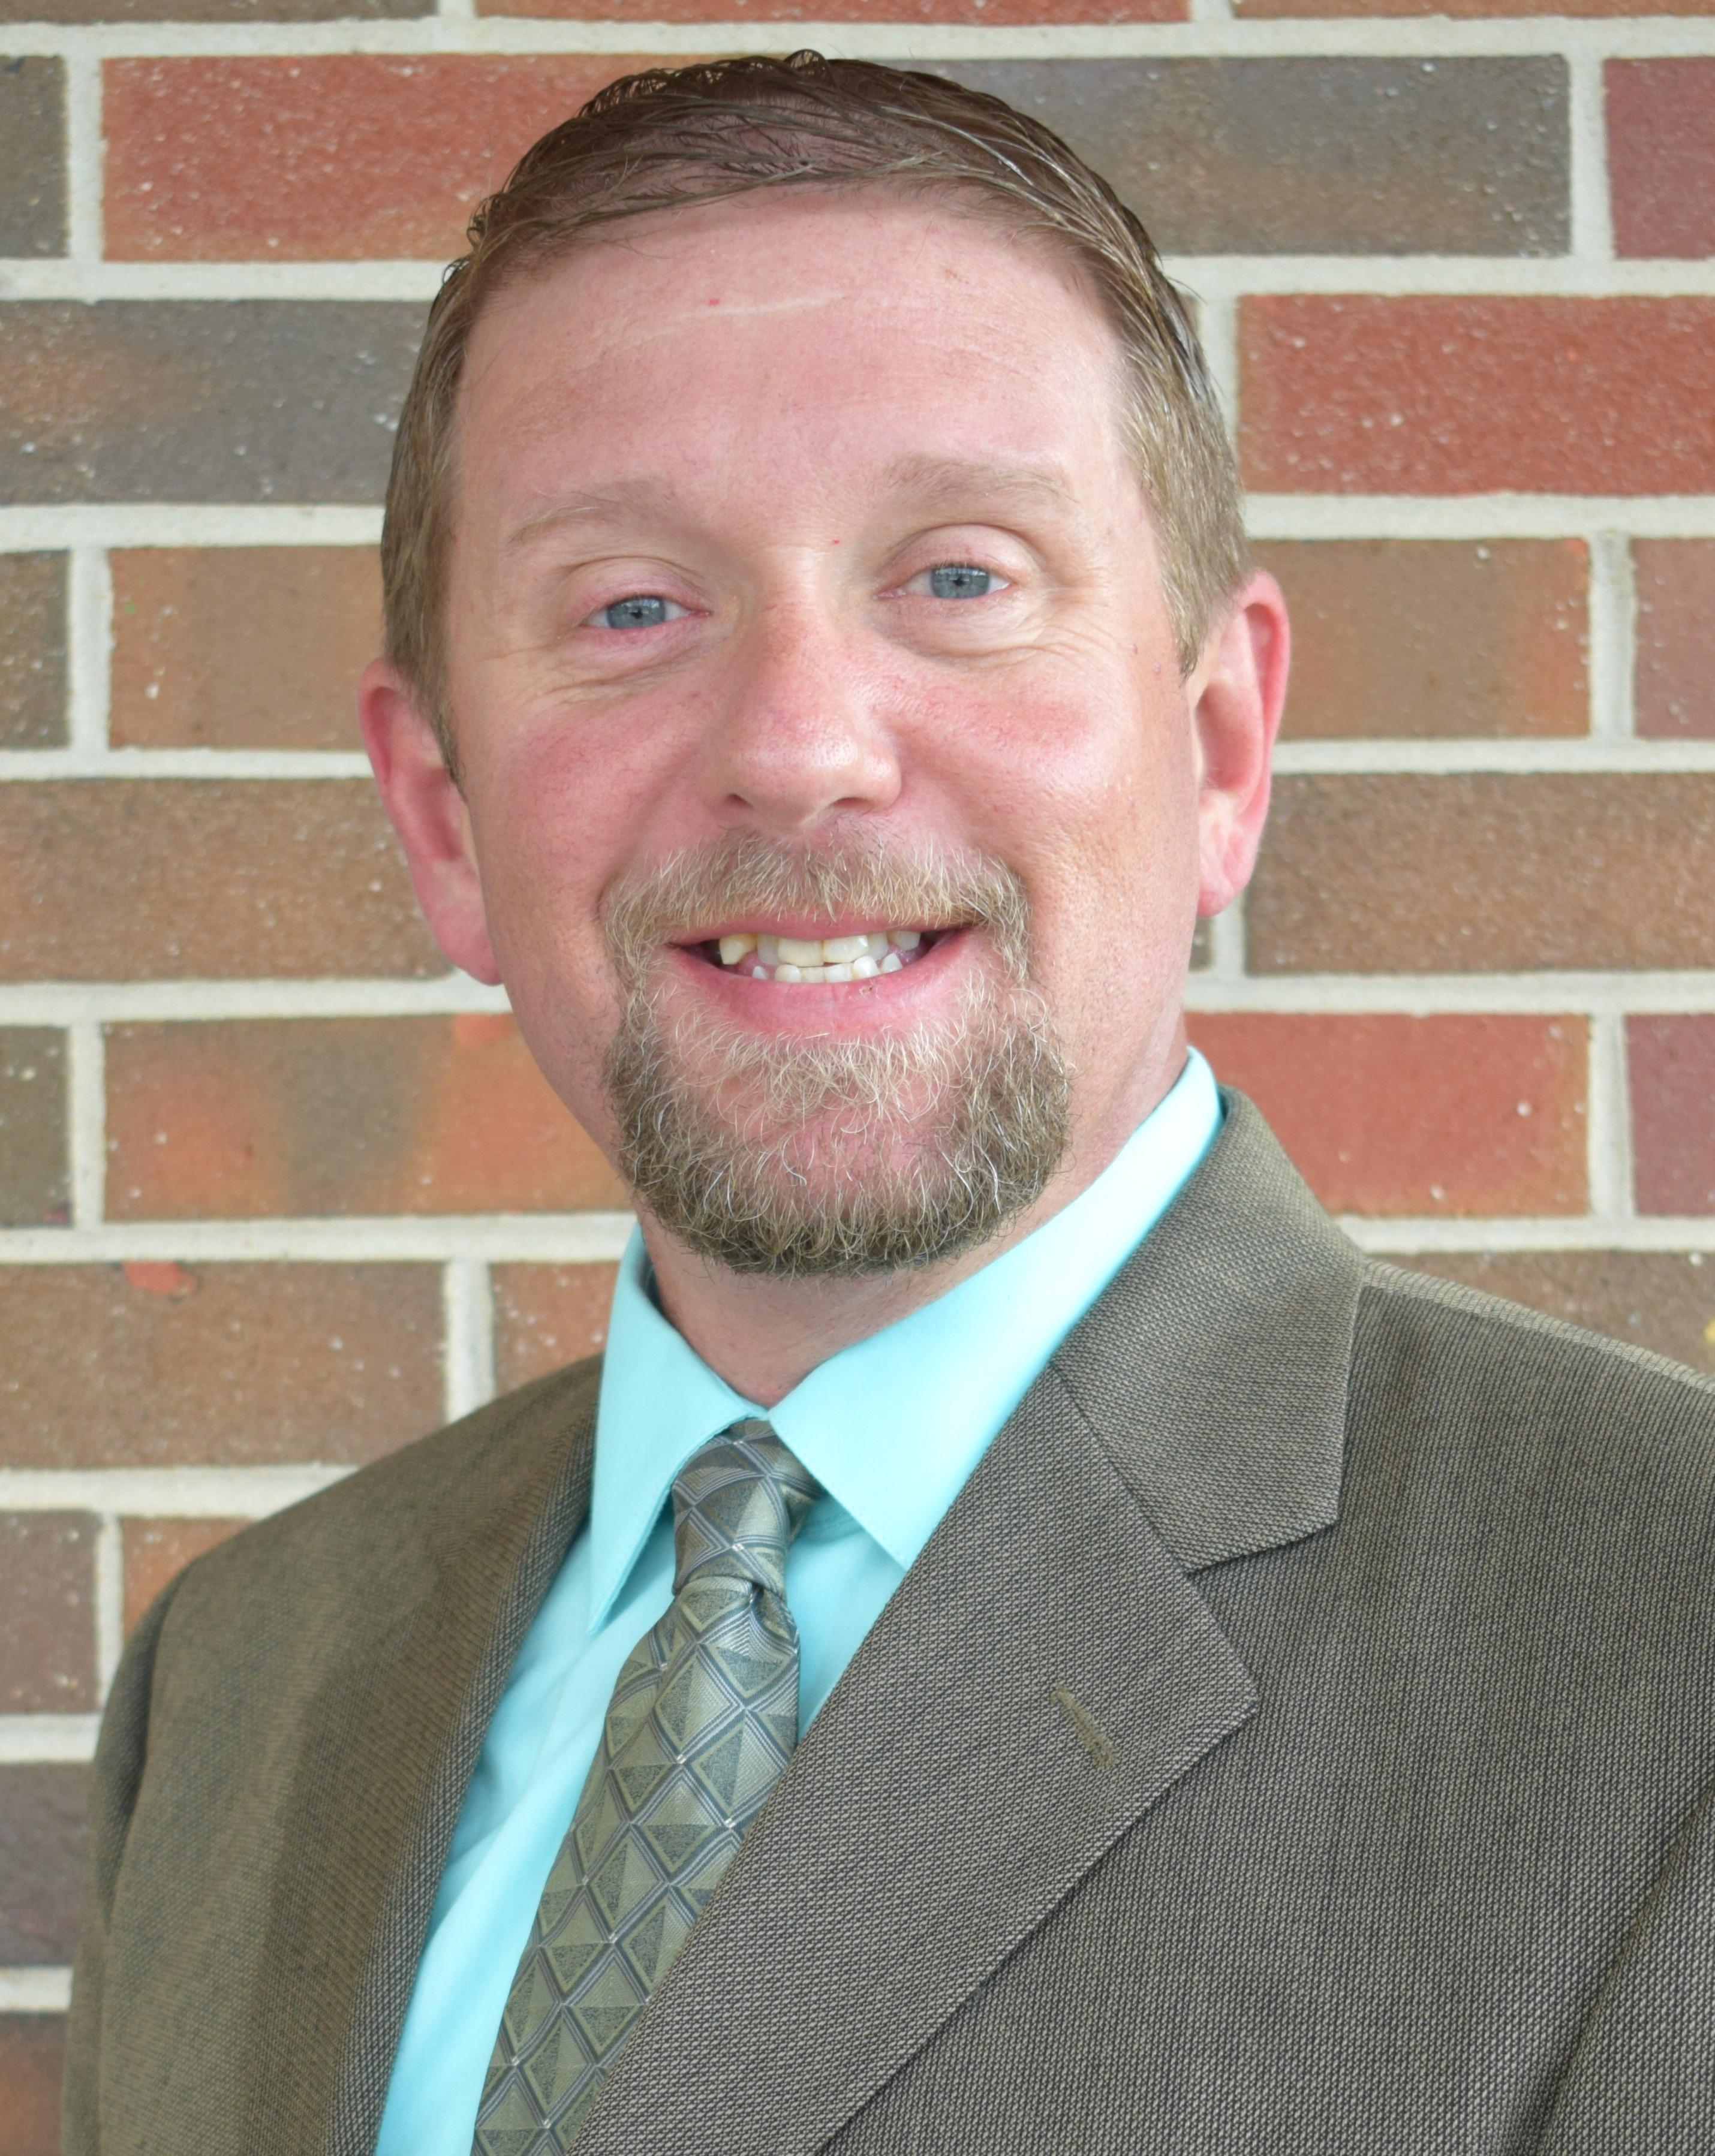 Jack Culpepper, Asst. Director of Transportation